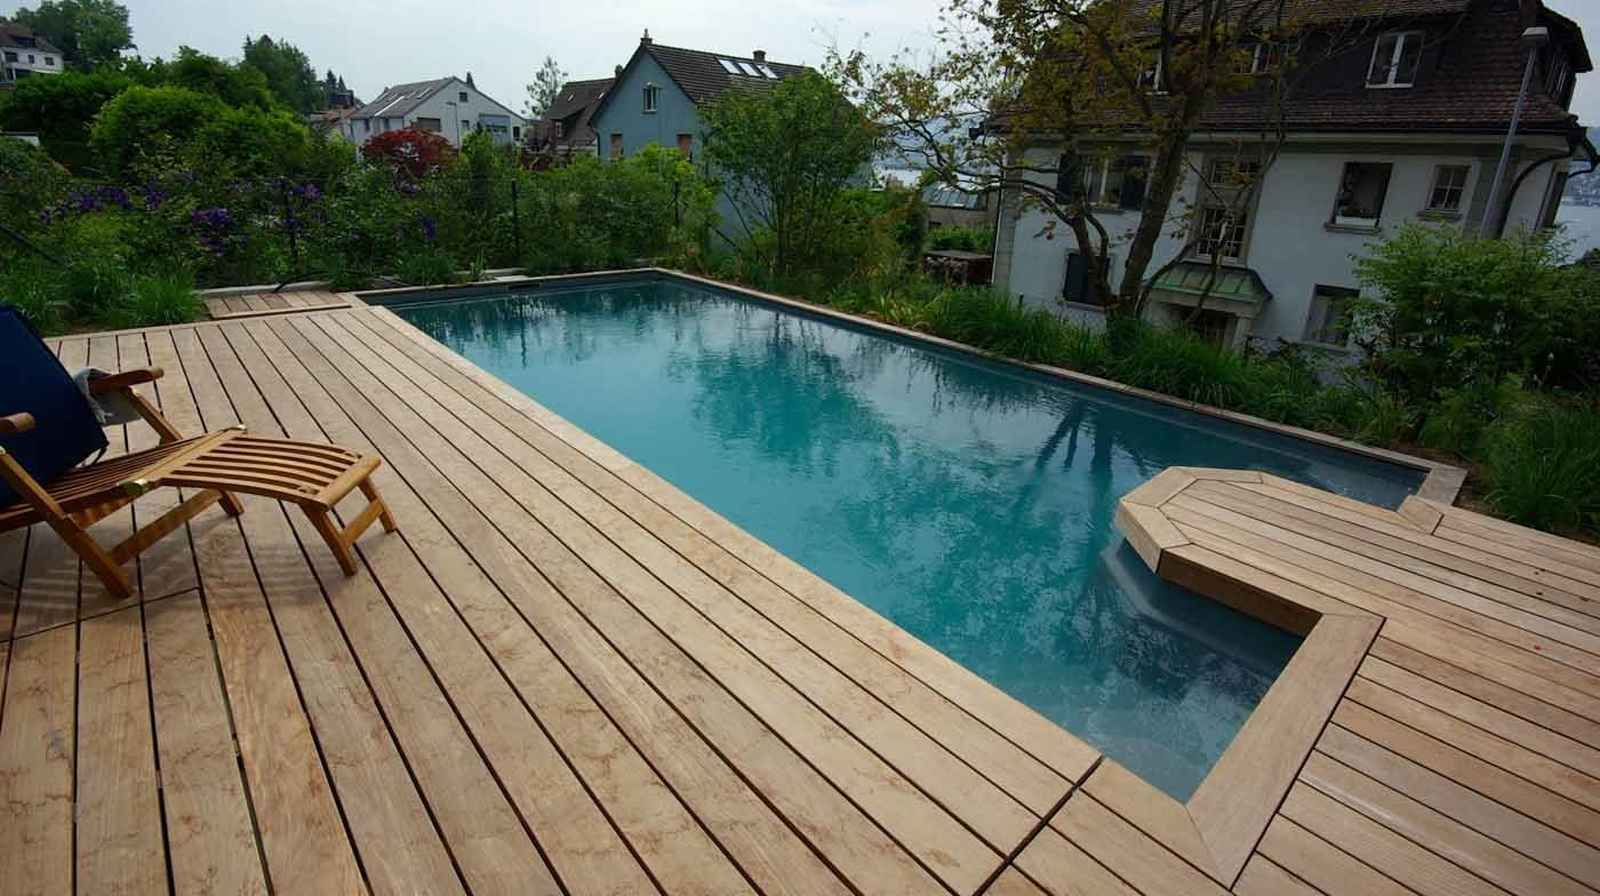 modell bali 80 schwimmbadtechnik frankfurt. Black Bedroom Furniture Sets. Home Design Ideas